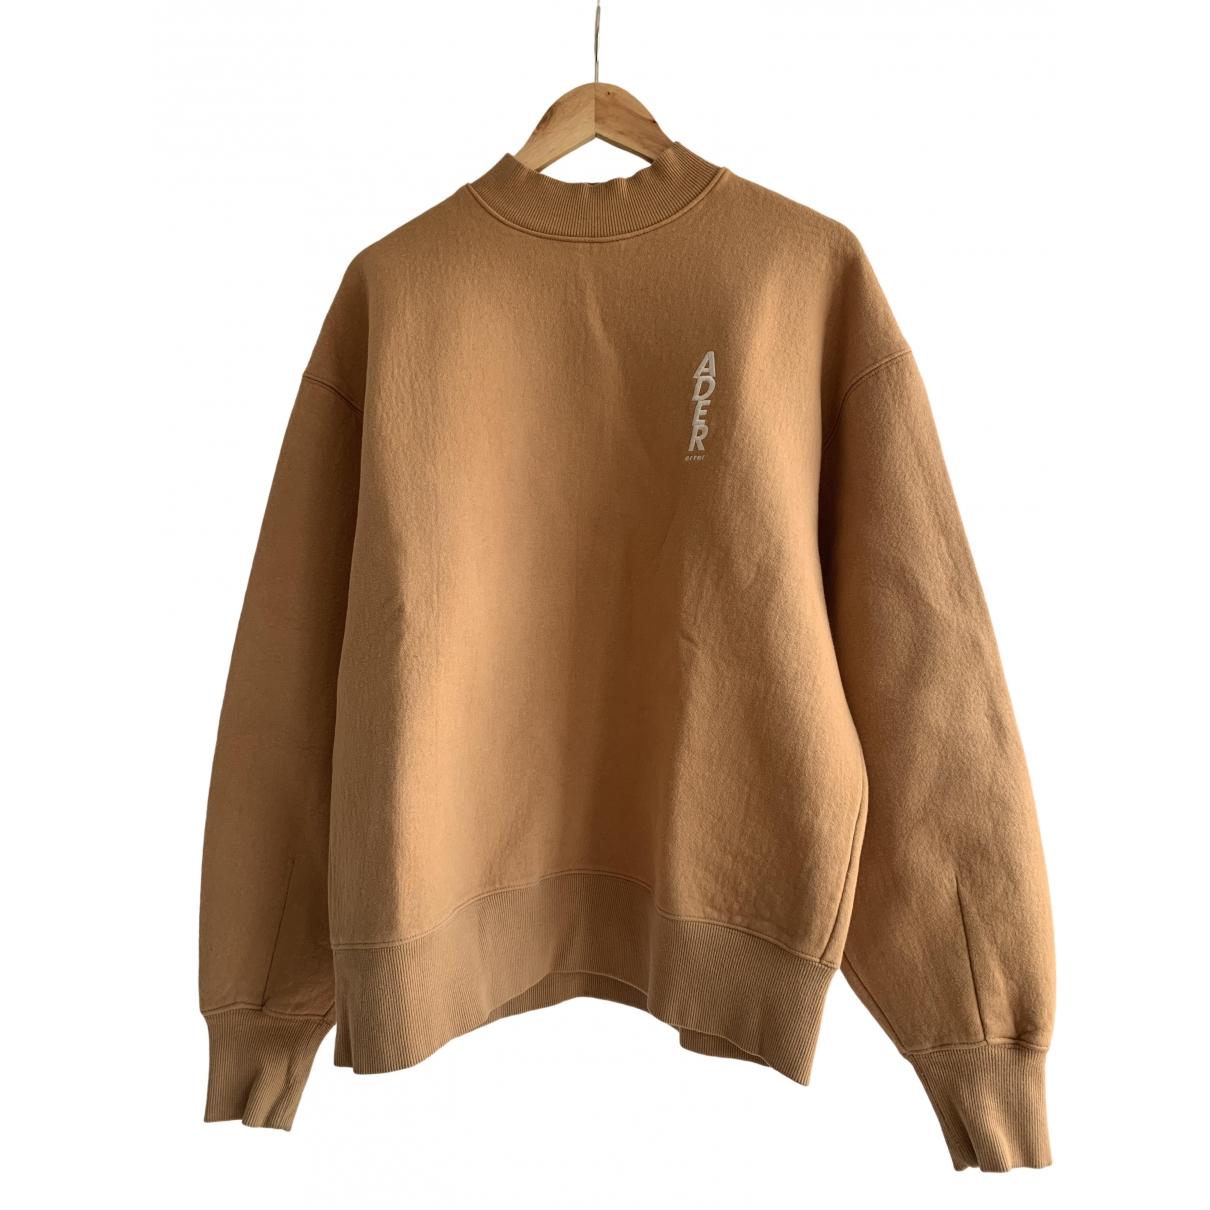 Ader Error N Camel Cotton Knitwear & Sweatshirts